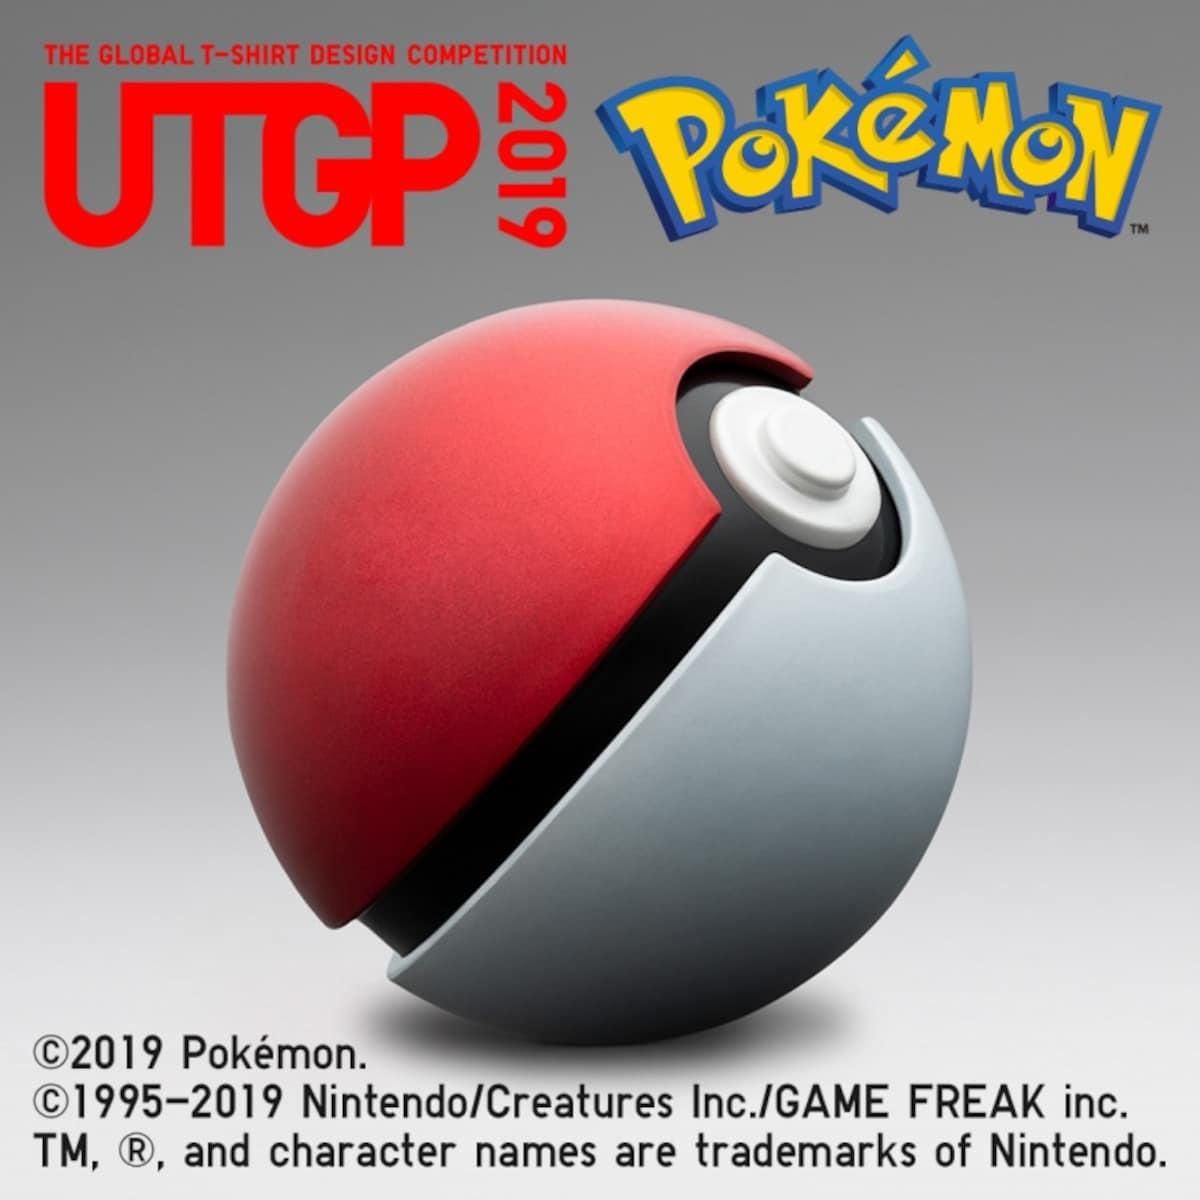 eb23478f Uniqlo Pokémon T-Shirt Design Winners | All About Japan